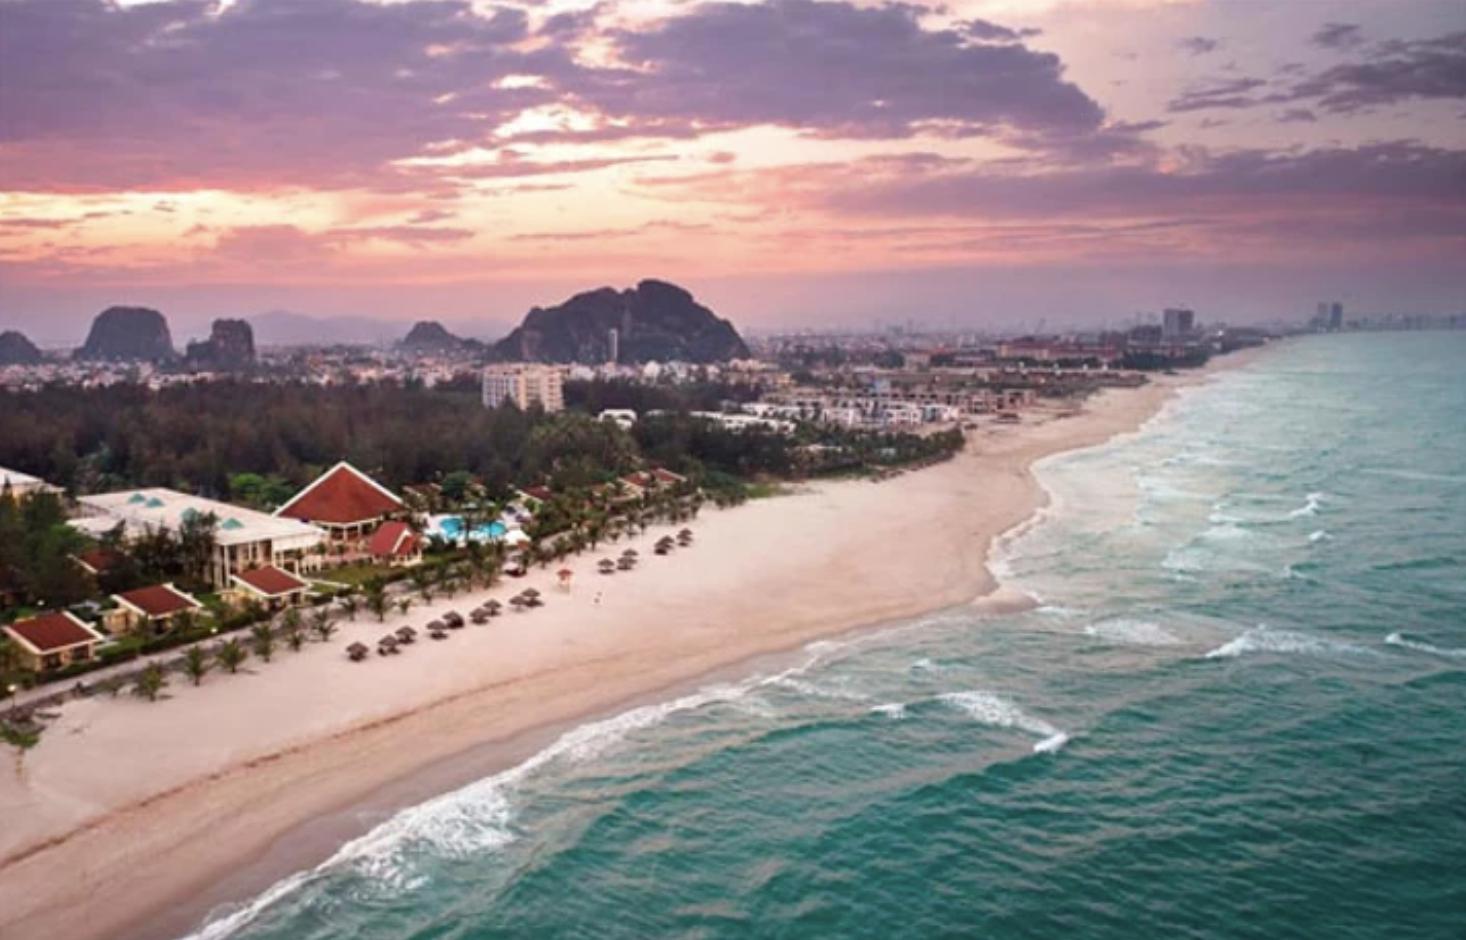 DANANG Centara Sandy Beach Resort – up to 40% discount